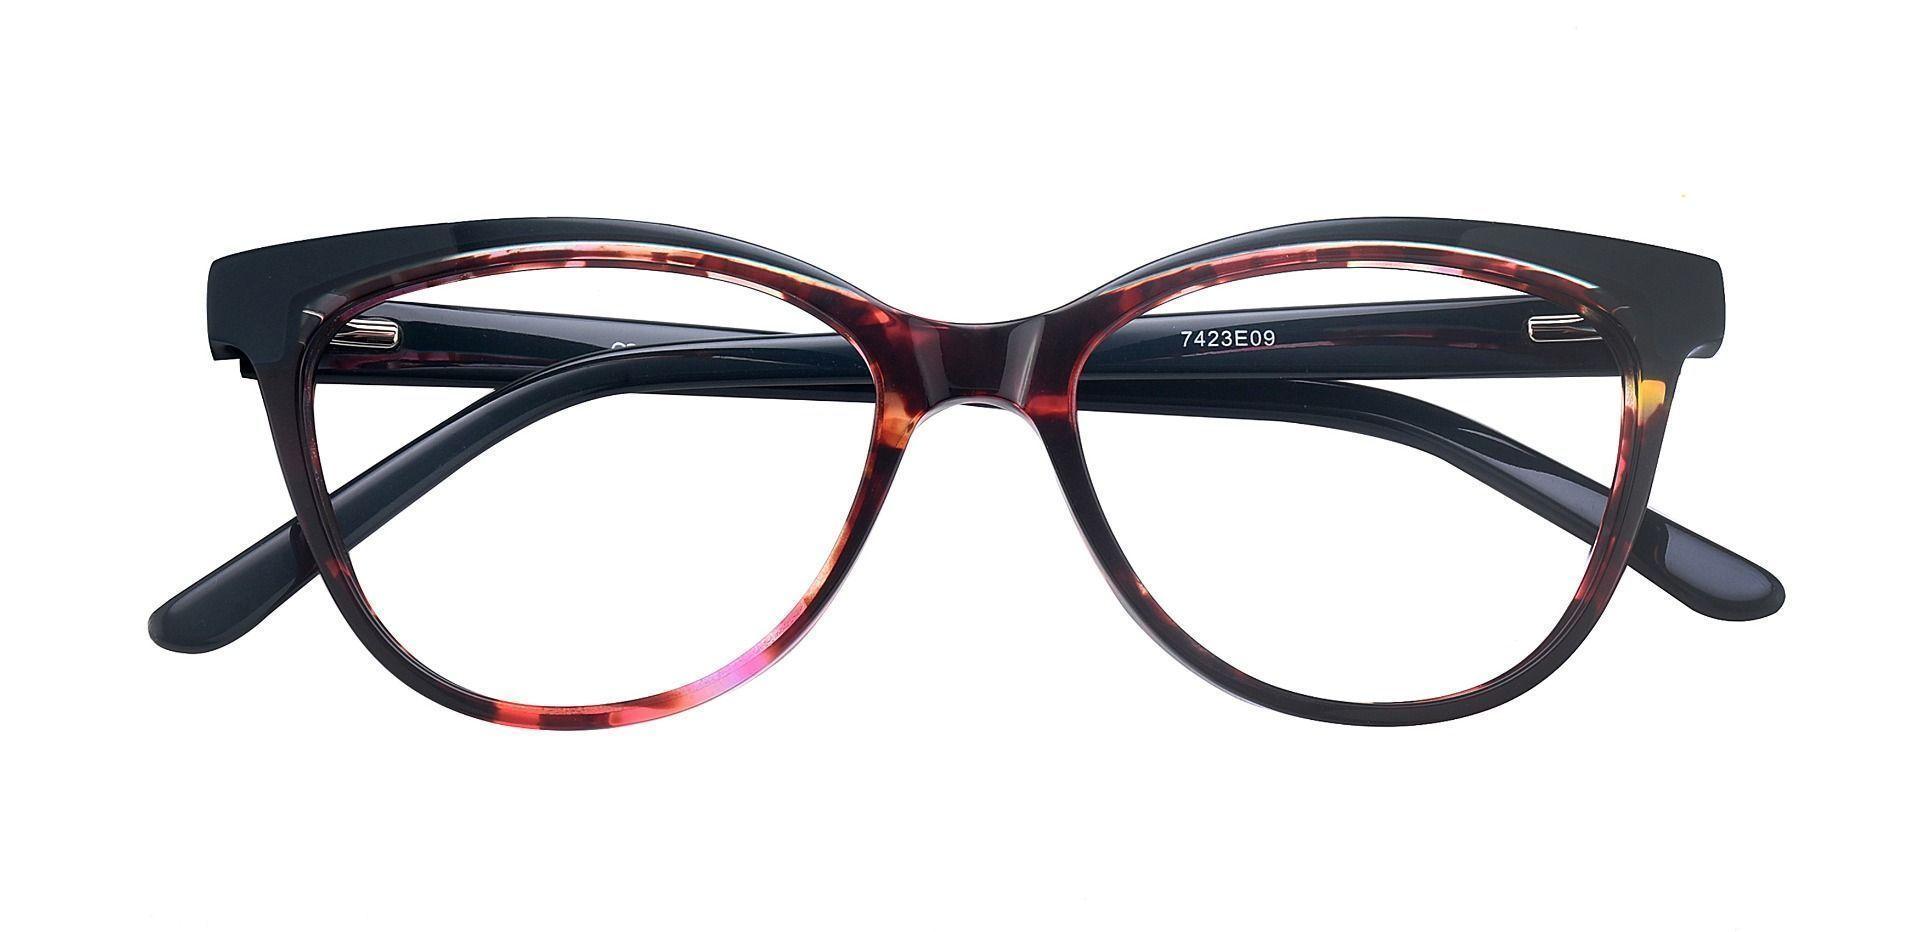 Fleck Cat-Eye Blue Light Blocking Glasses - Floral